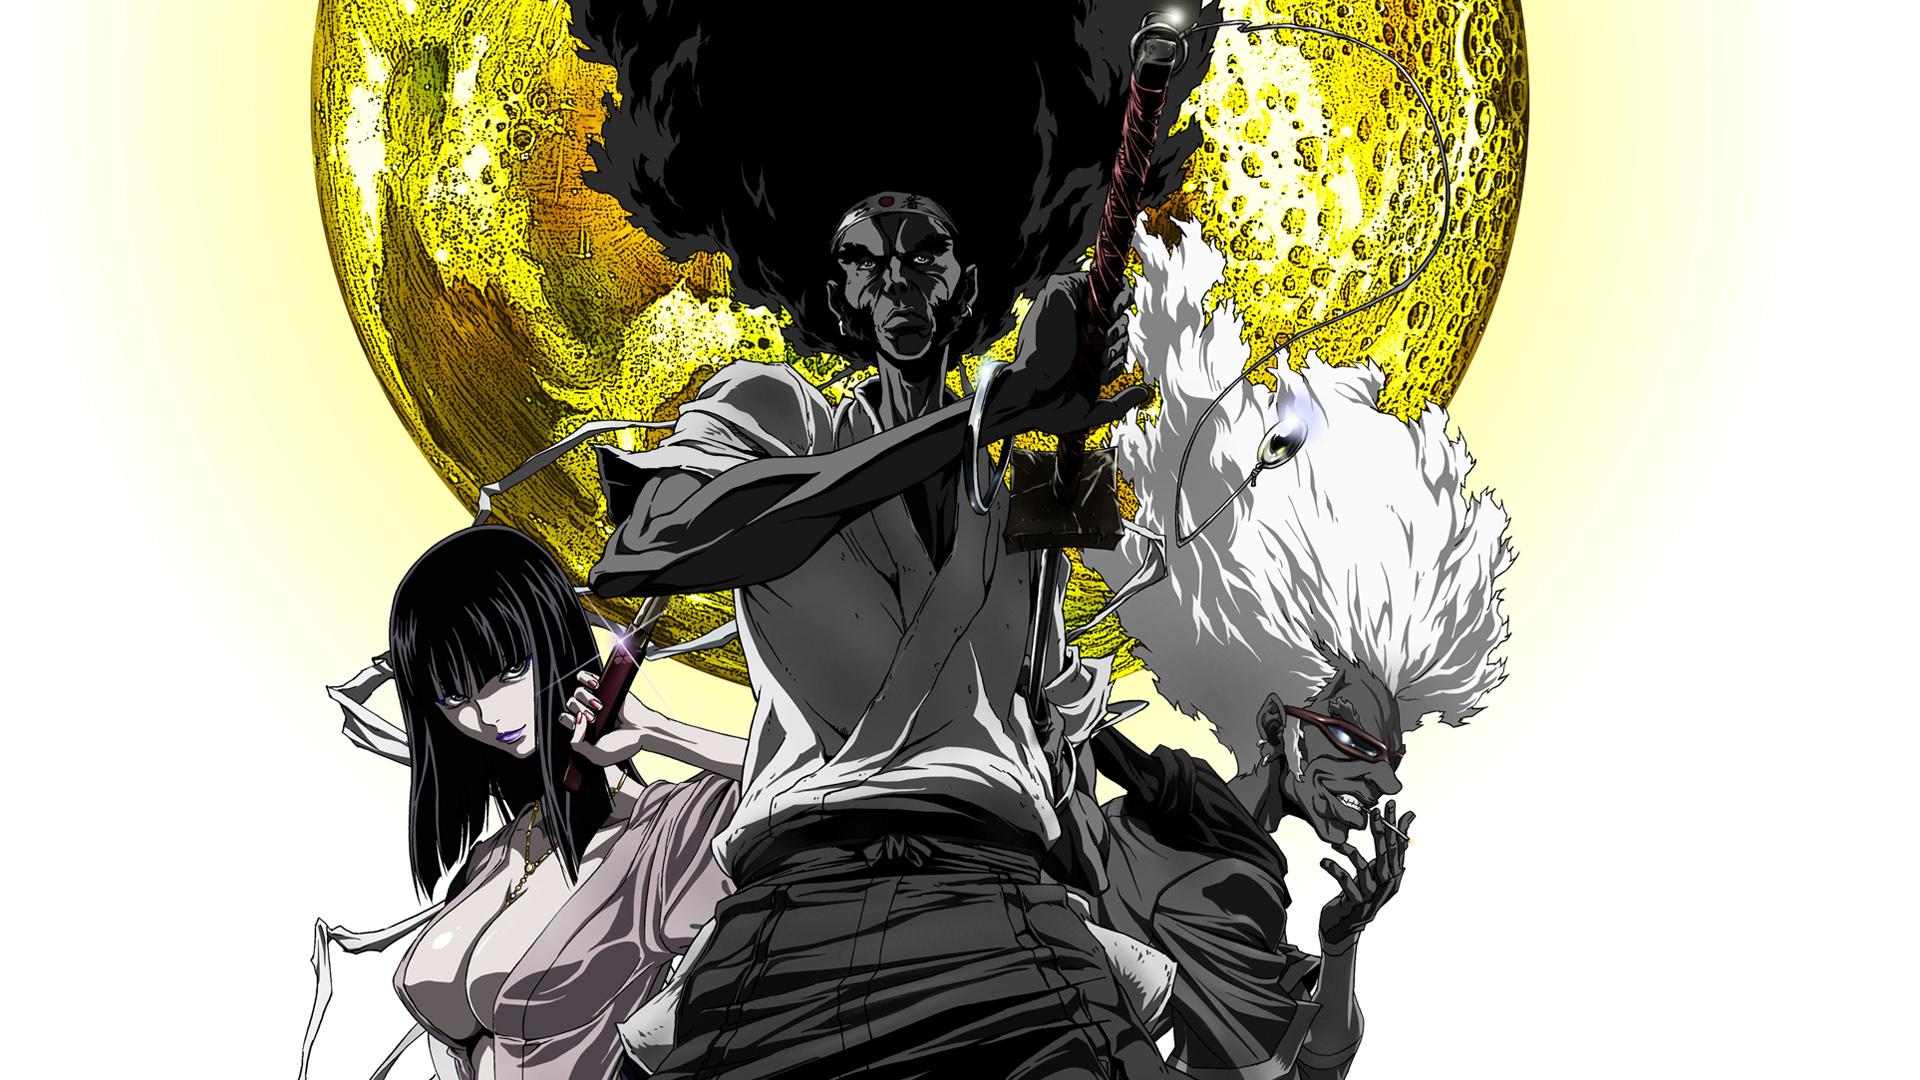 Afro Samurai: Resurrection [Directors Cut] [DVD] [2008